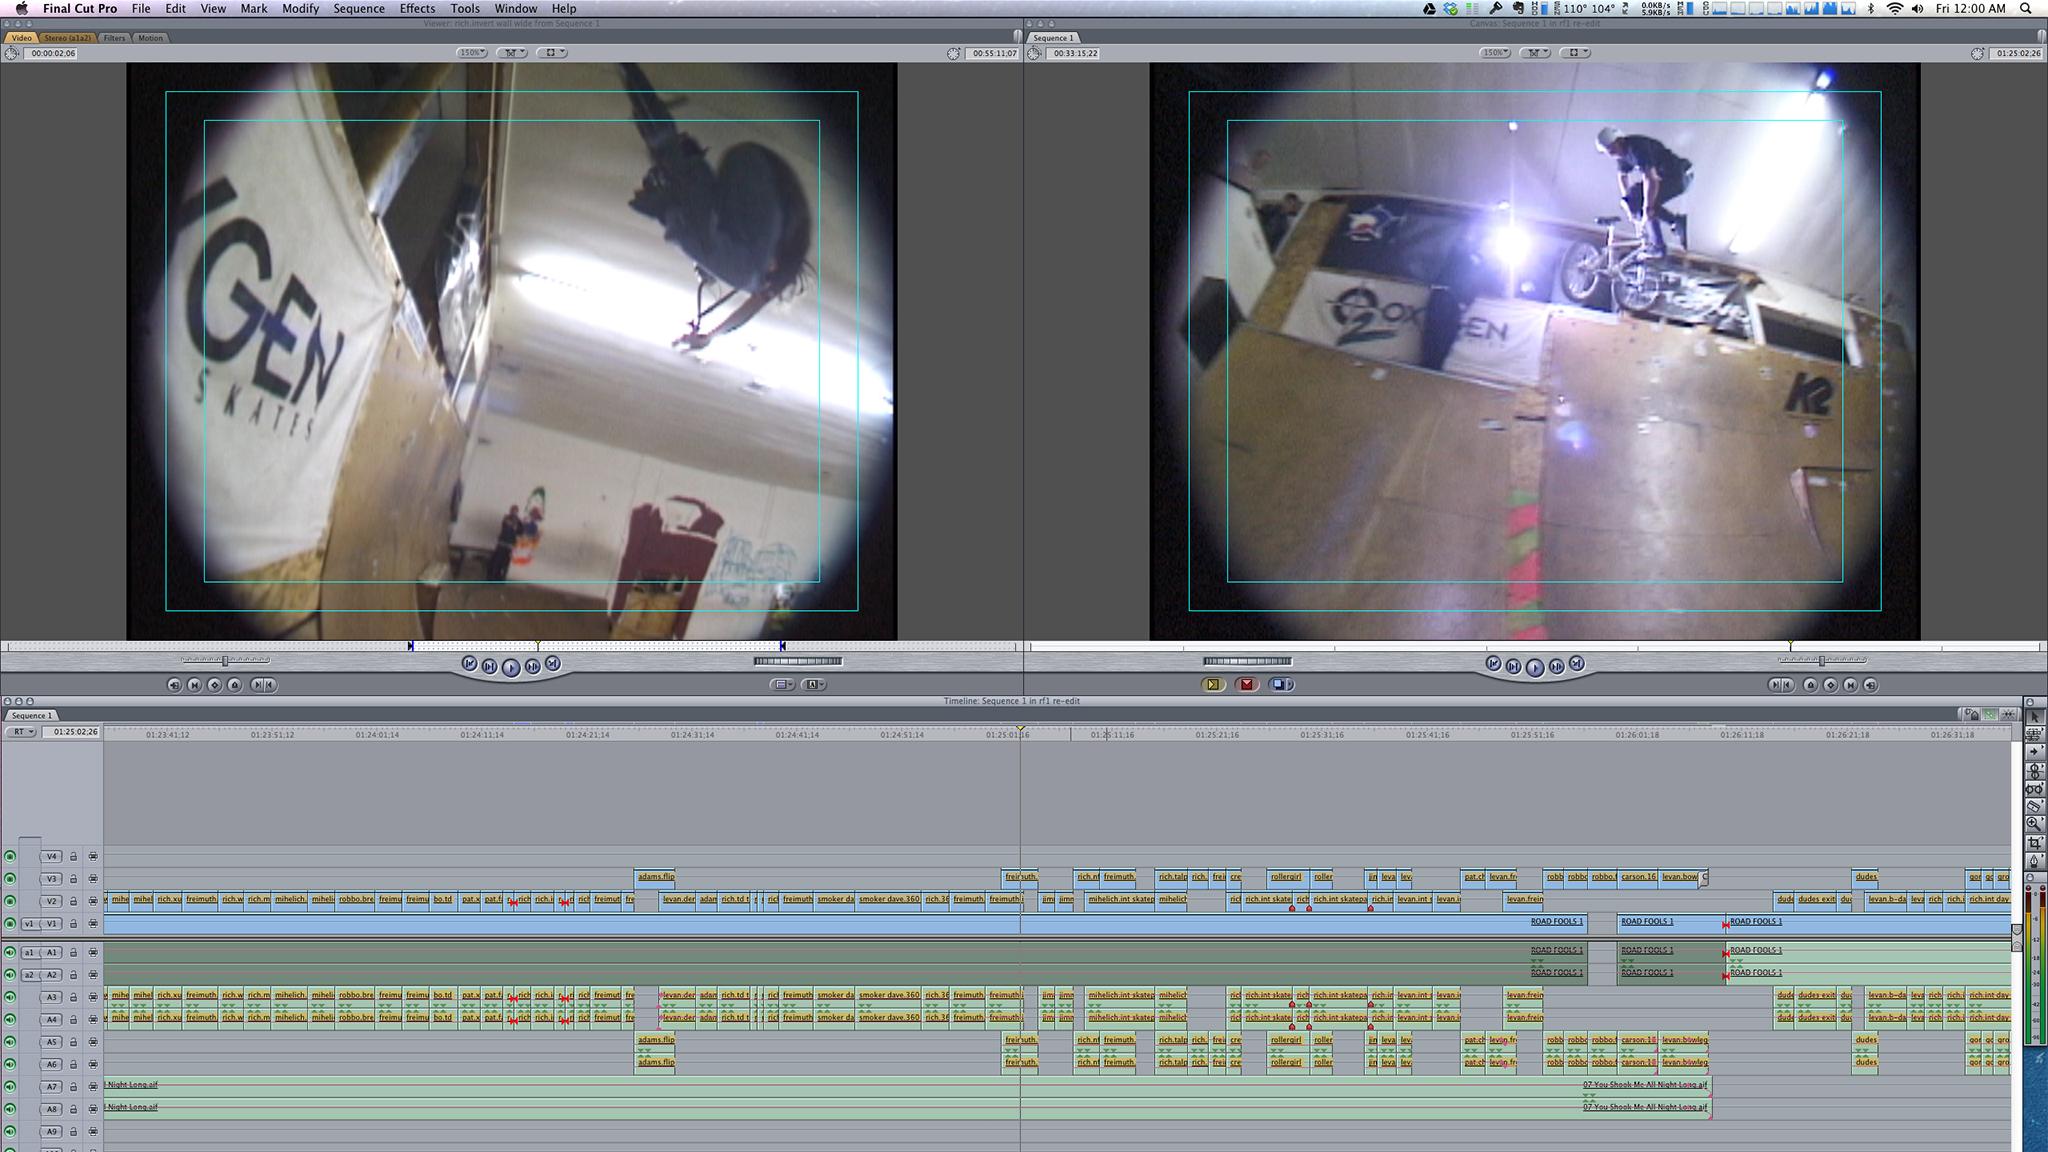 Re-editing in progress.